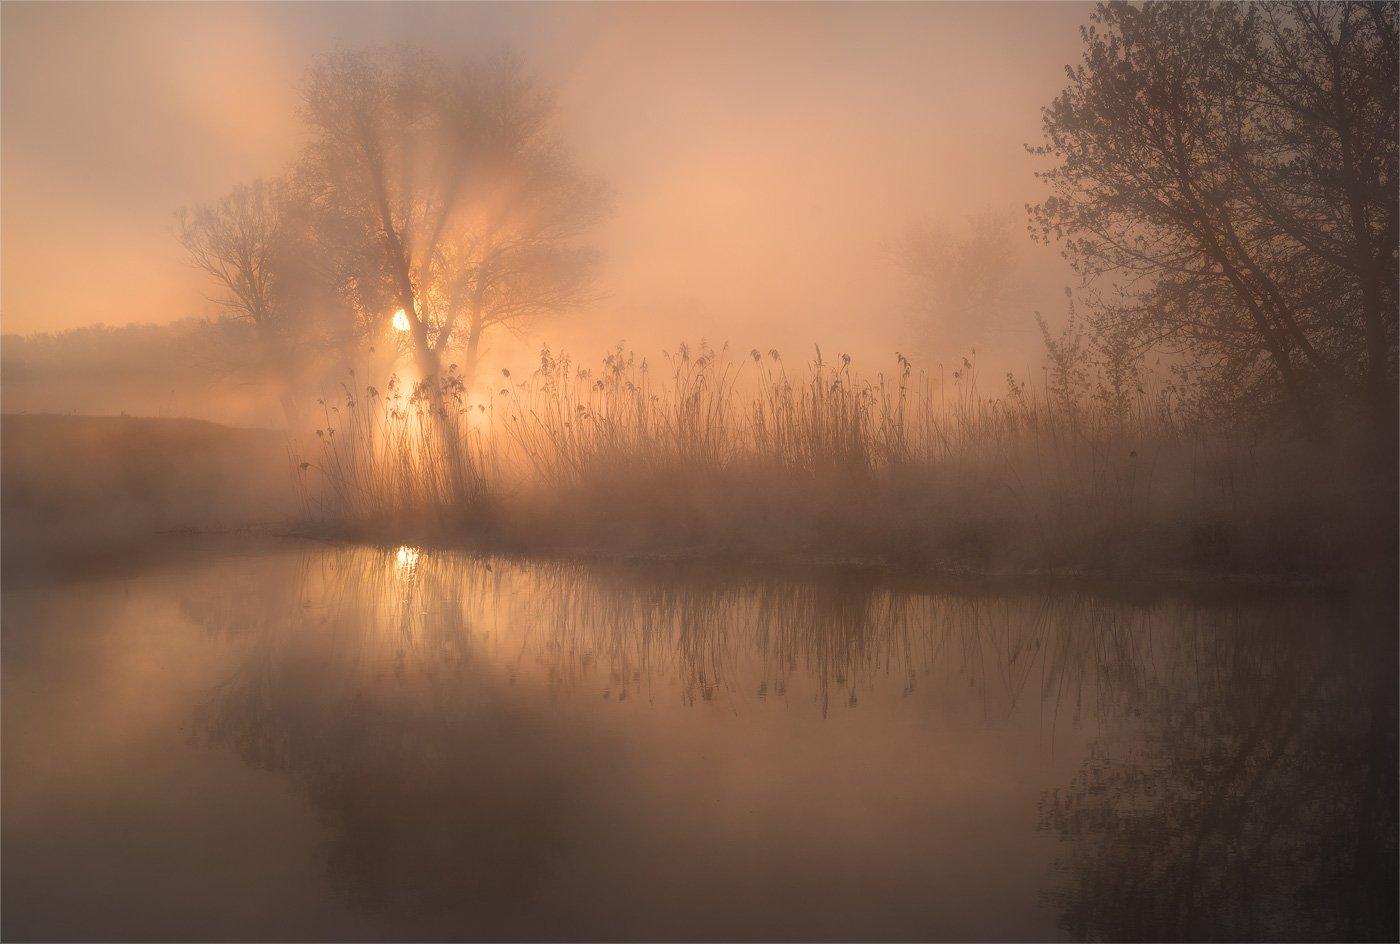 утро, река, туман, солнце, лучи, весна, sony, Александр Киценко